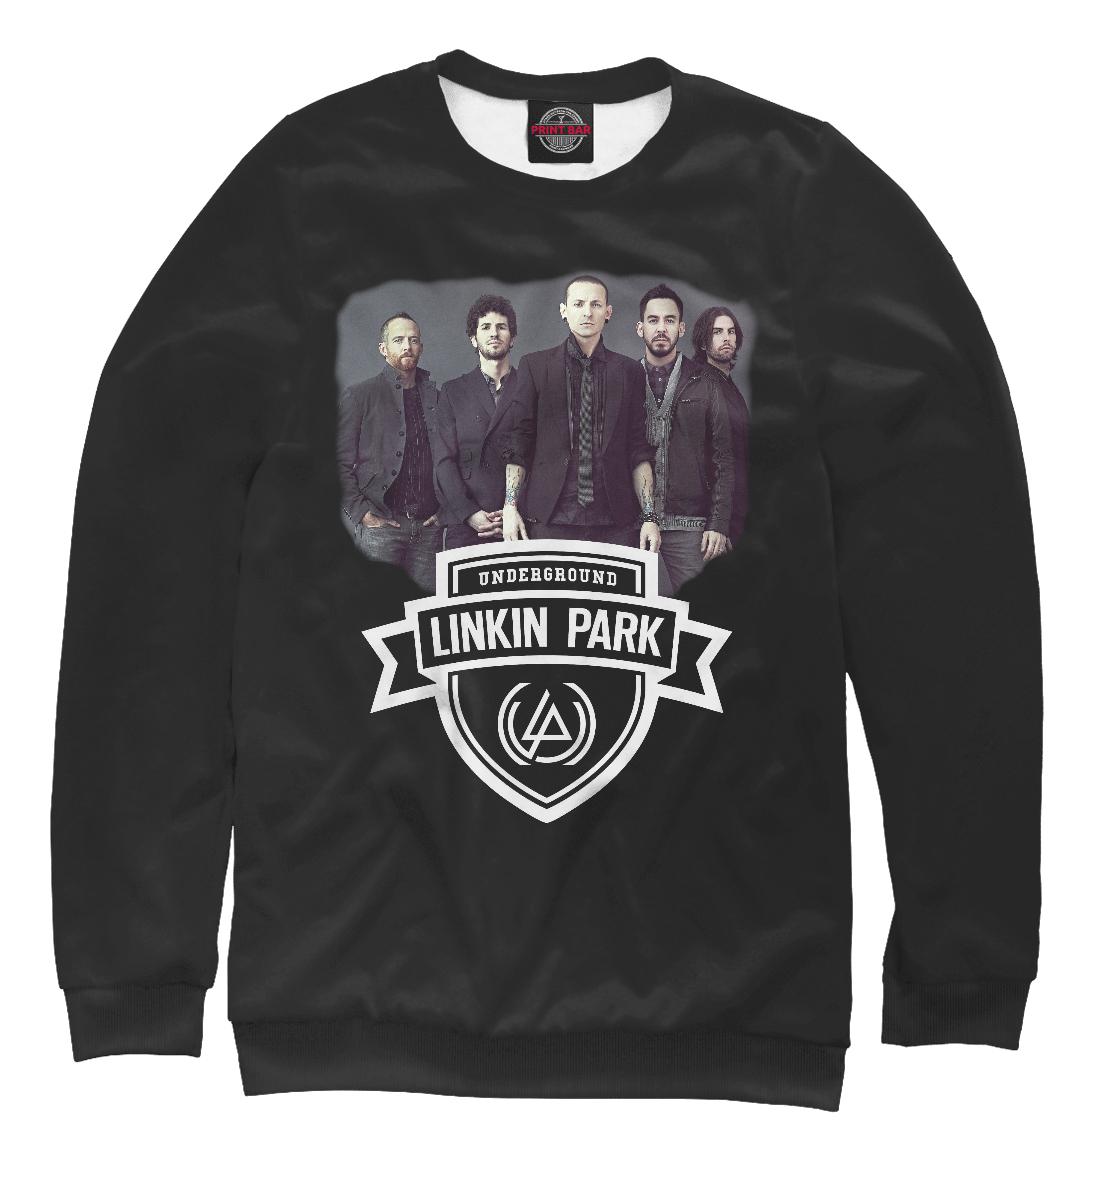 Купить Linkin Park & Chester Bennington, Printbar, Свитшоты, LIN-105449-swi-2